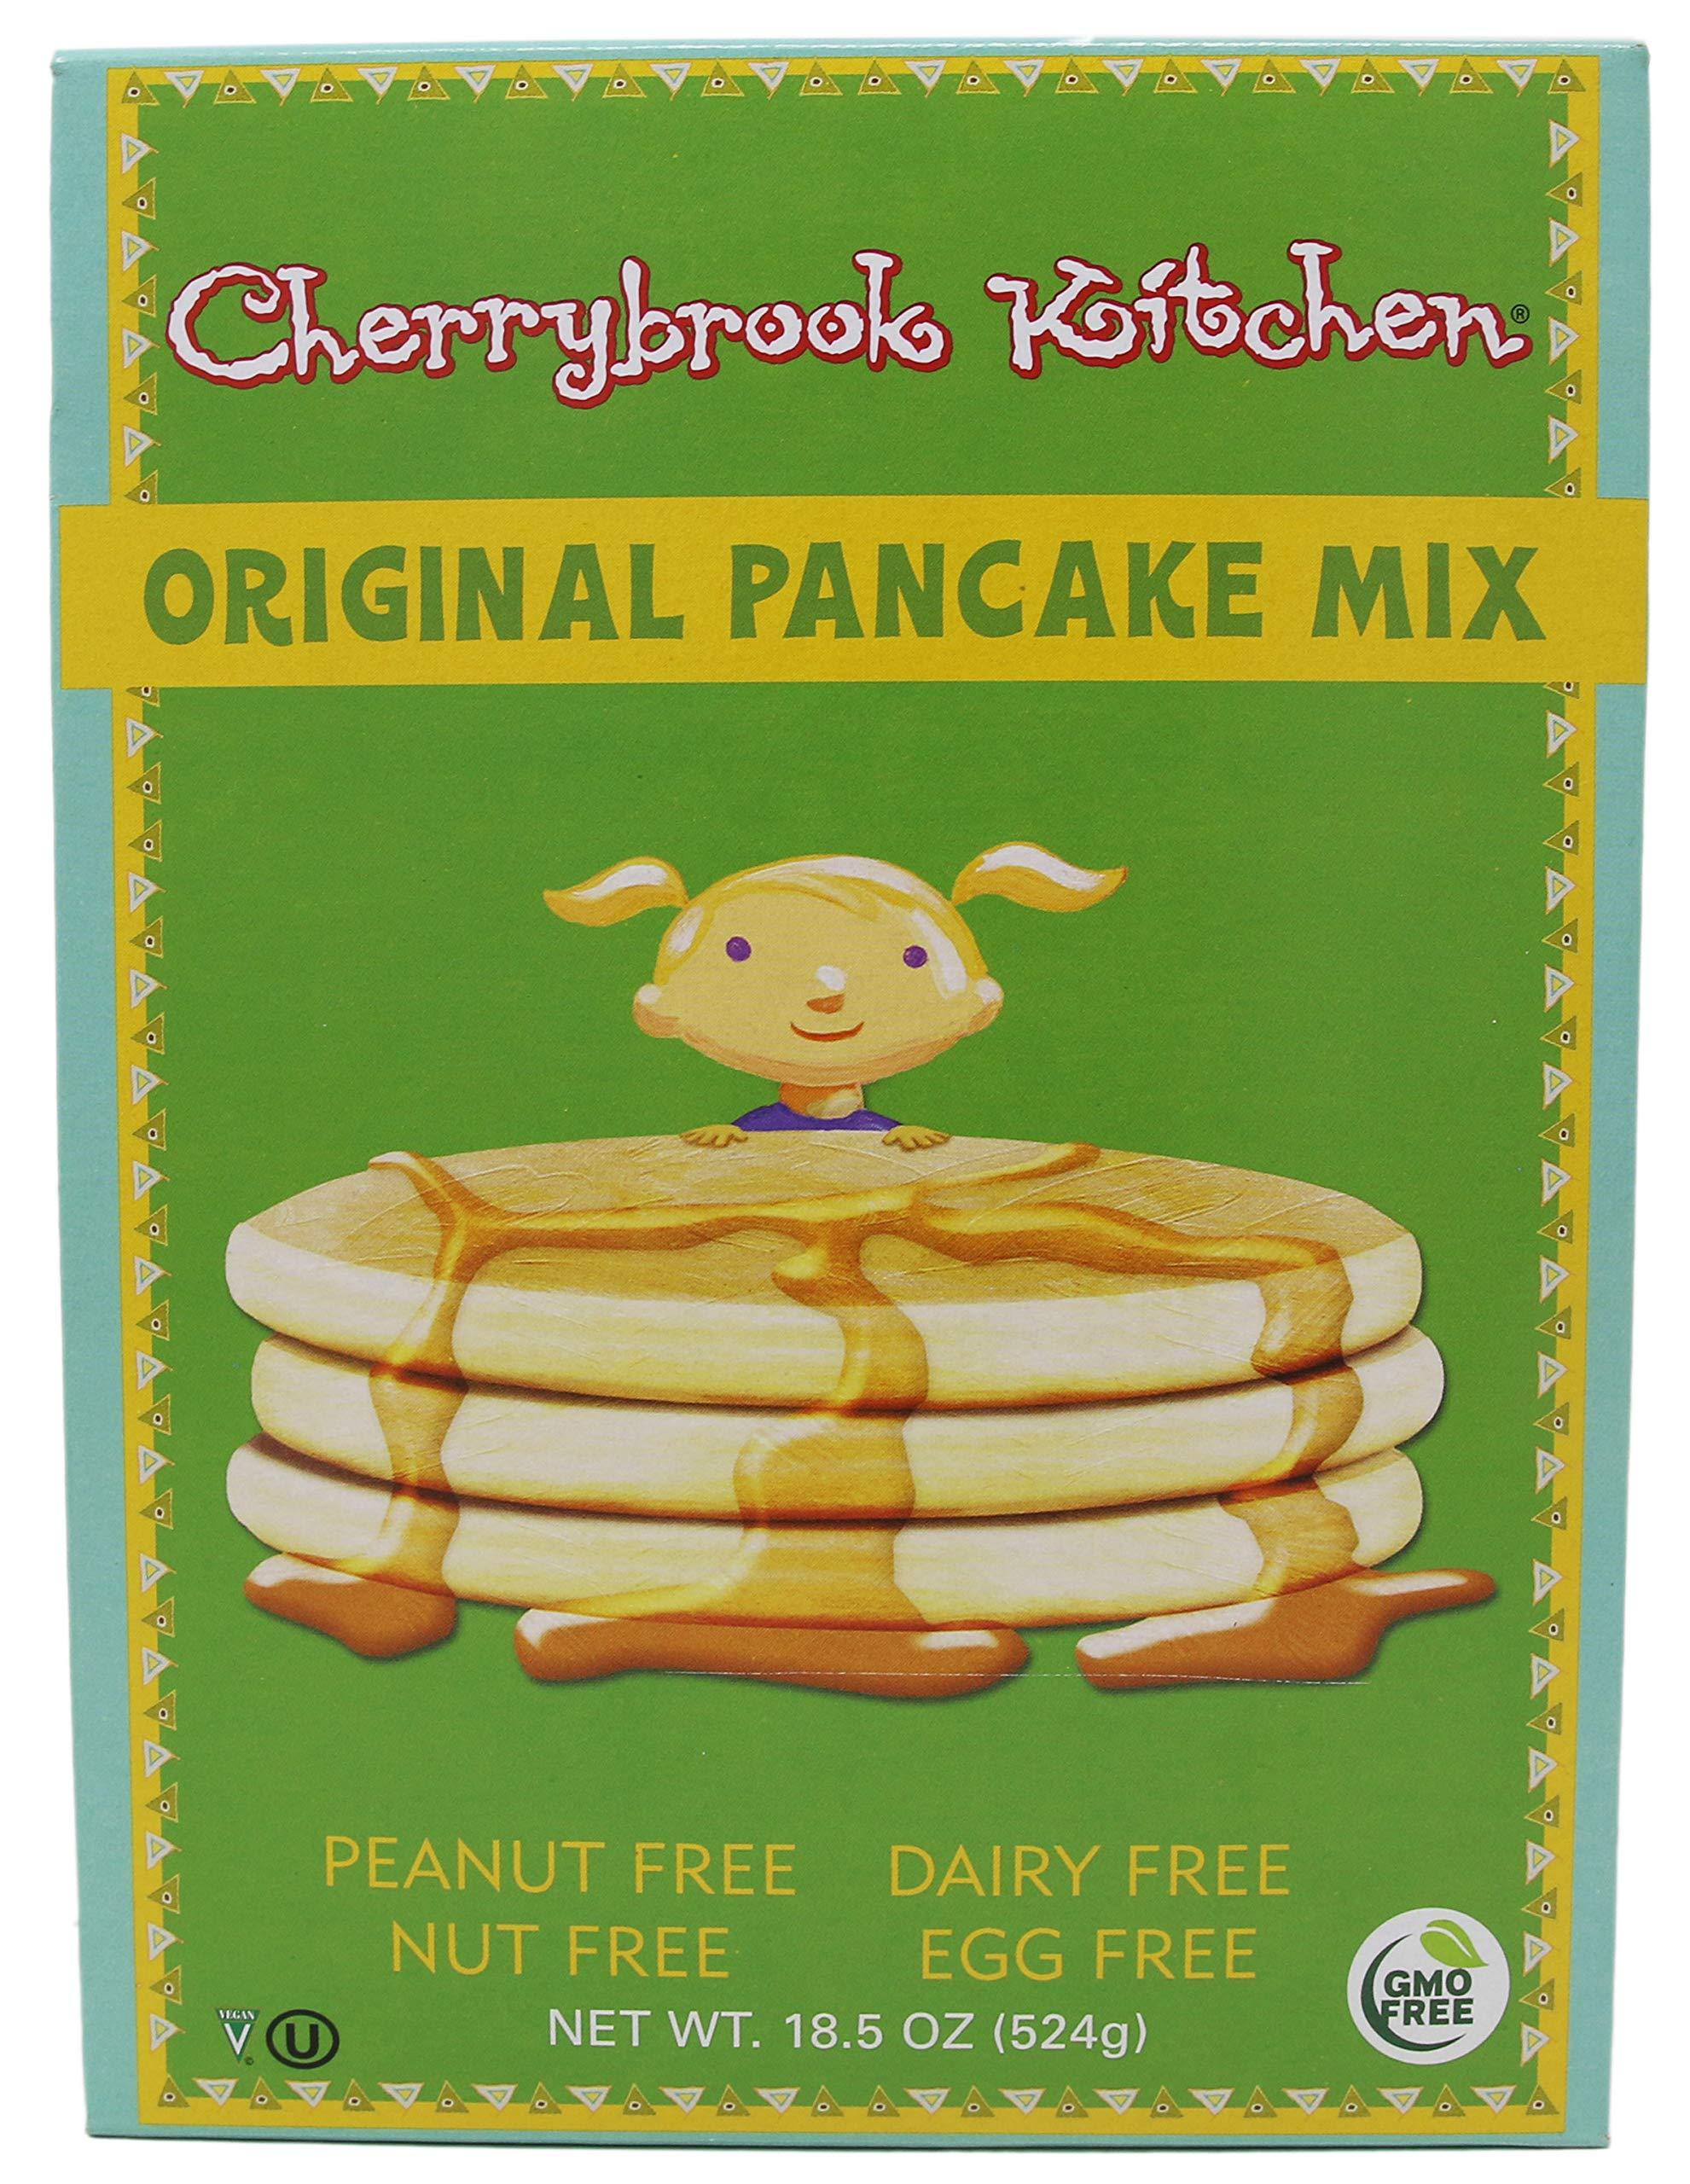 Cherrybrook Kitchen Original Pancake Mix, 18.5 oz (Pack of 6) by Cherrybrook Kitchen